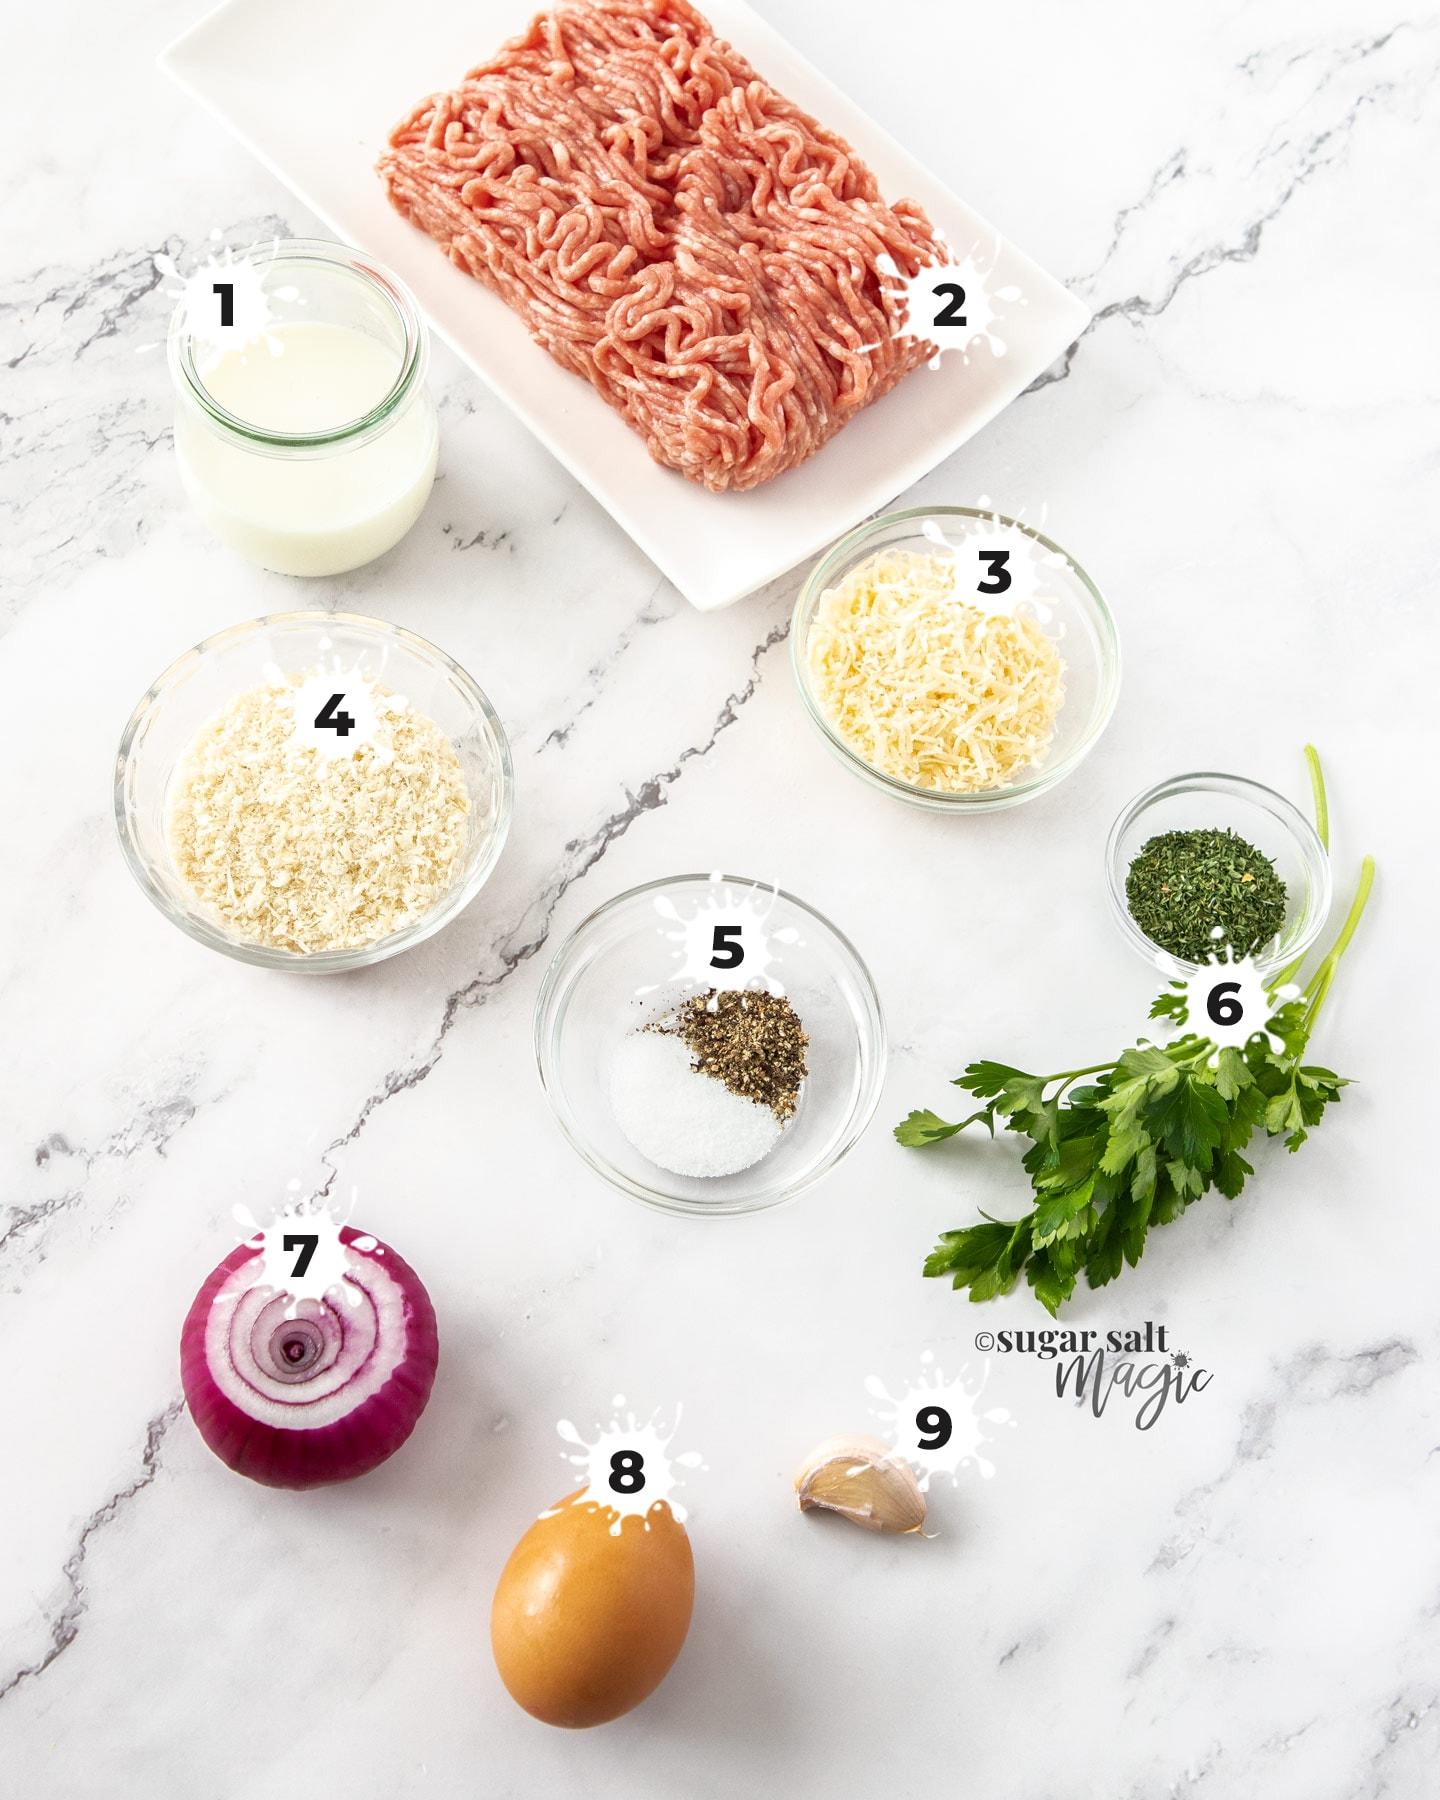 Ingredients for Italian meatballs on a marble worktop.